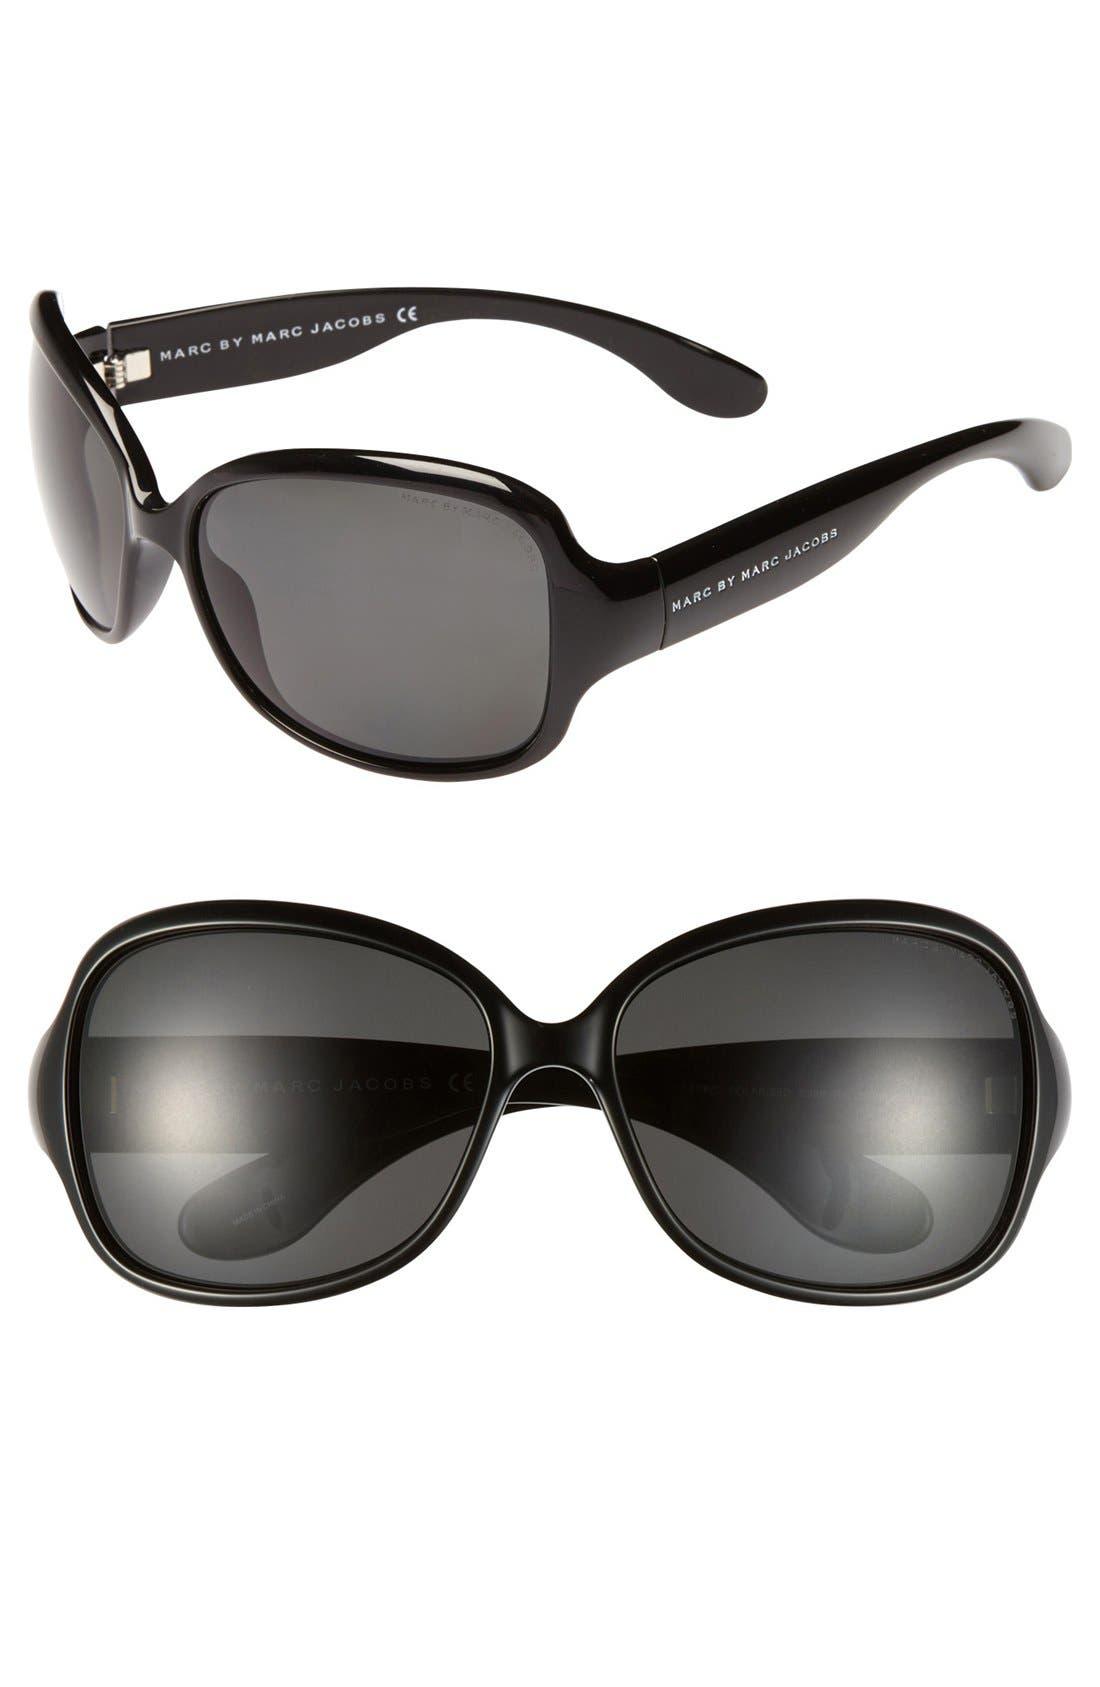 Main Image - MARC BY MARC JACOBS Polarized Oversized Sunglasses